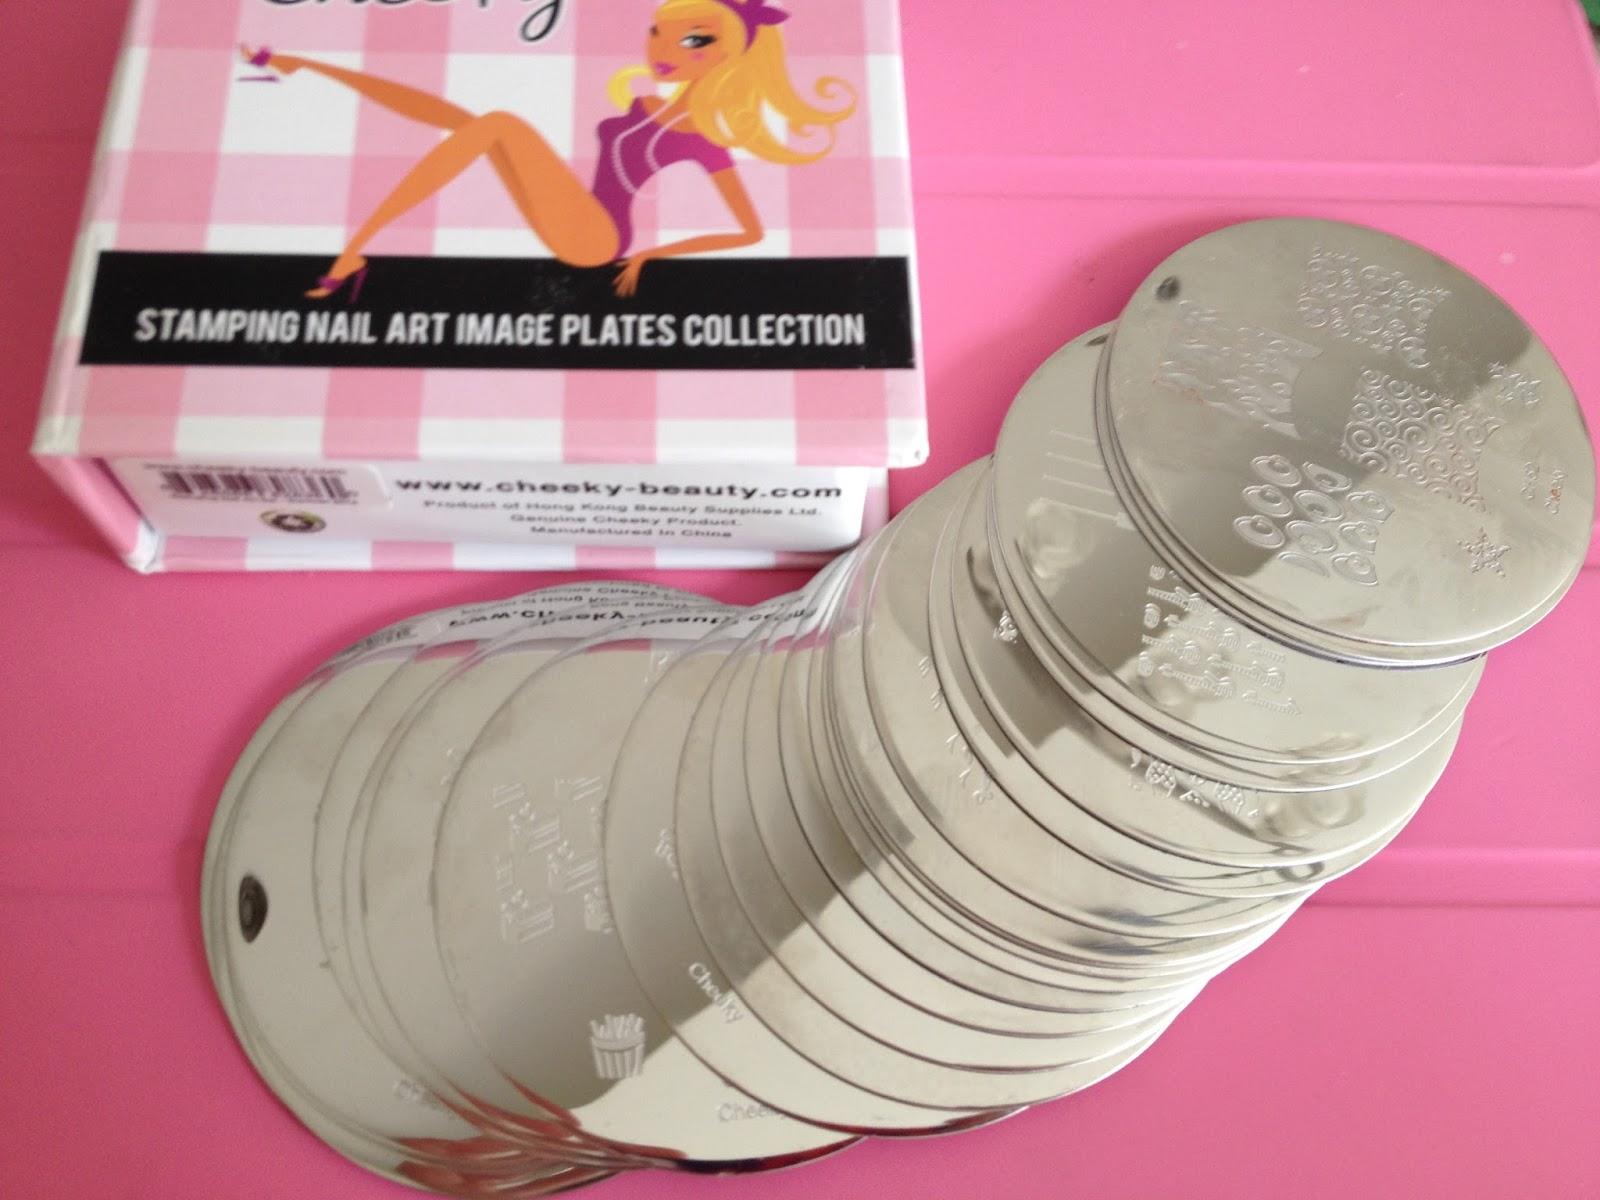 Stephanie Maverick Nail Art Stamping Plates Review